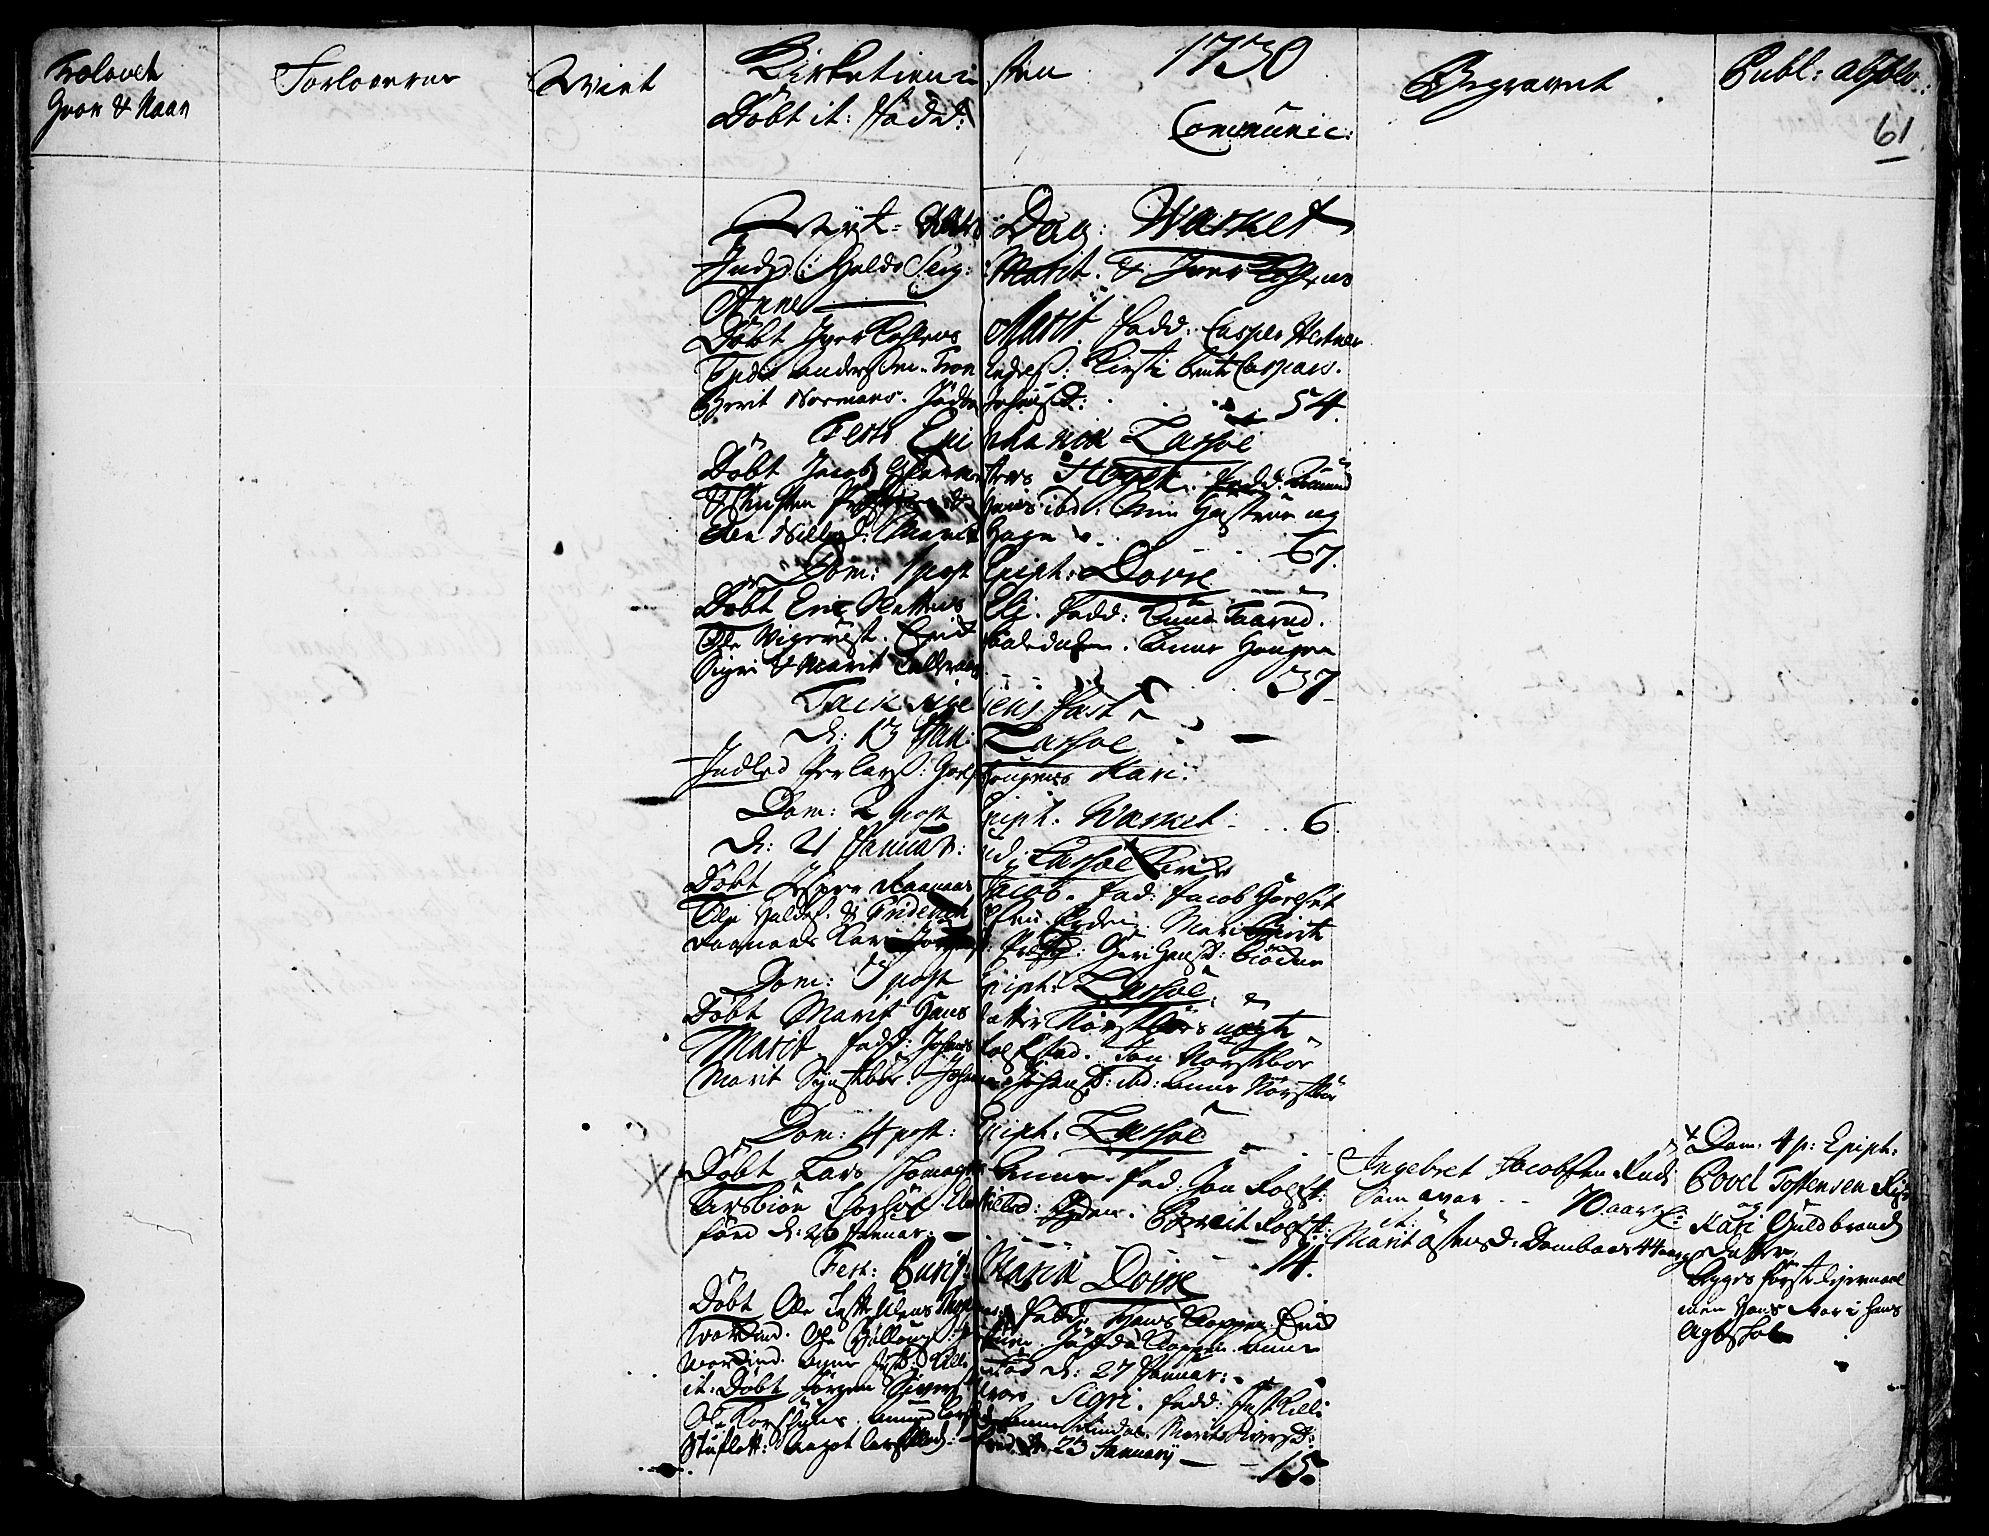 SAH, Lesja prestekontor, Ministerialbok nr. 1, 1724-1731, s. 61